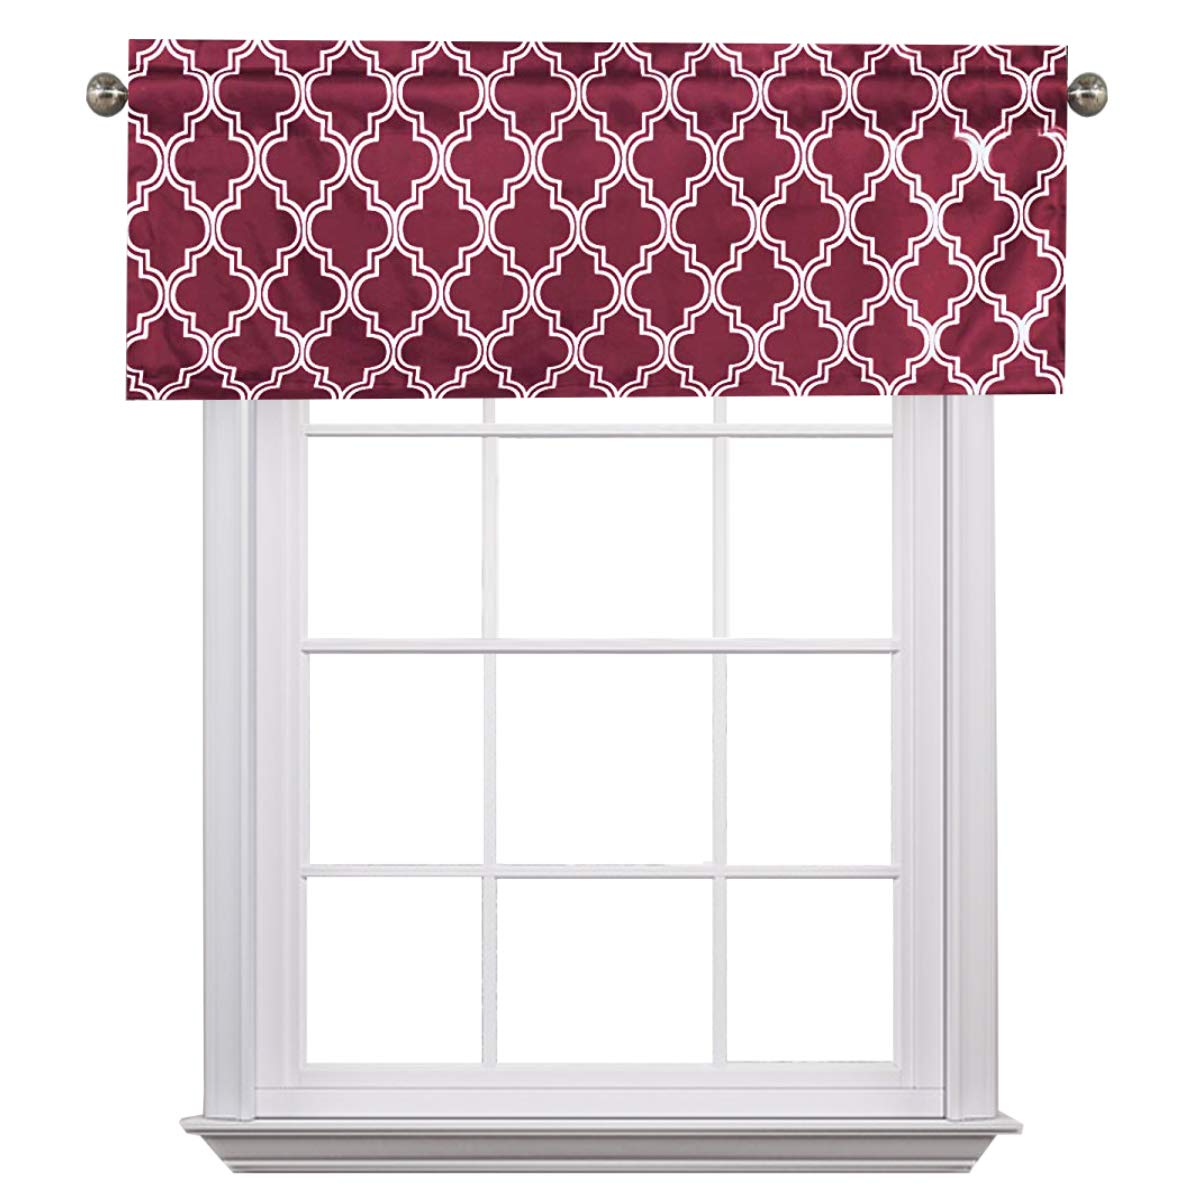 Flamingo P Ikat Fret Dove 2 Pack Valance Curtain for Kitchen Living Dining Room Bathroom Kids Girl Baby Nursery Bedroom 52 X18